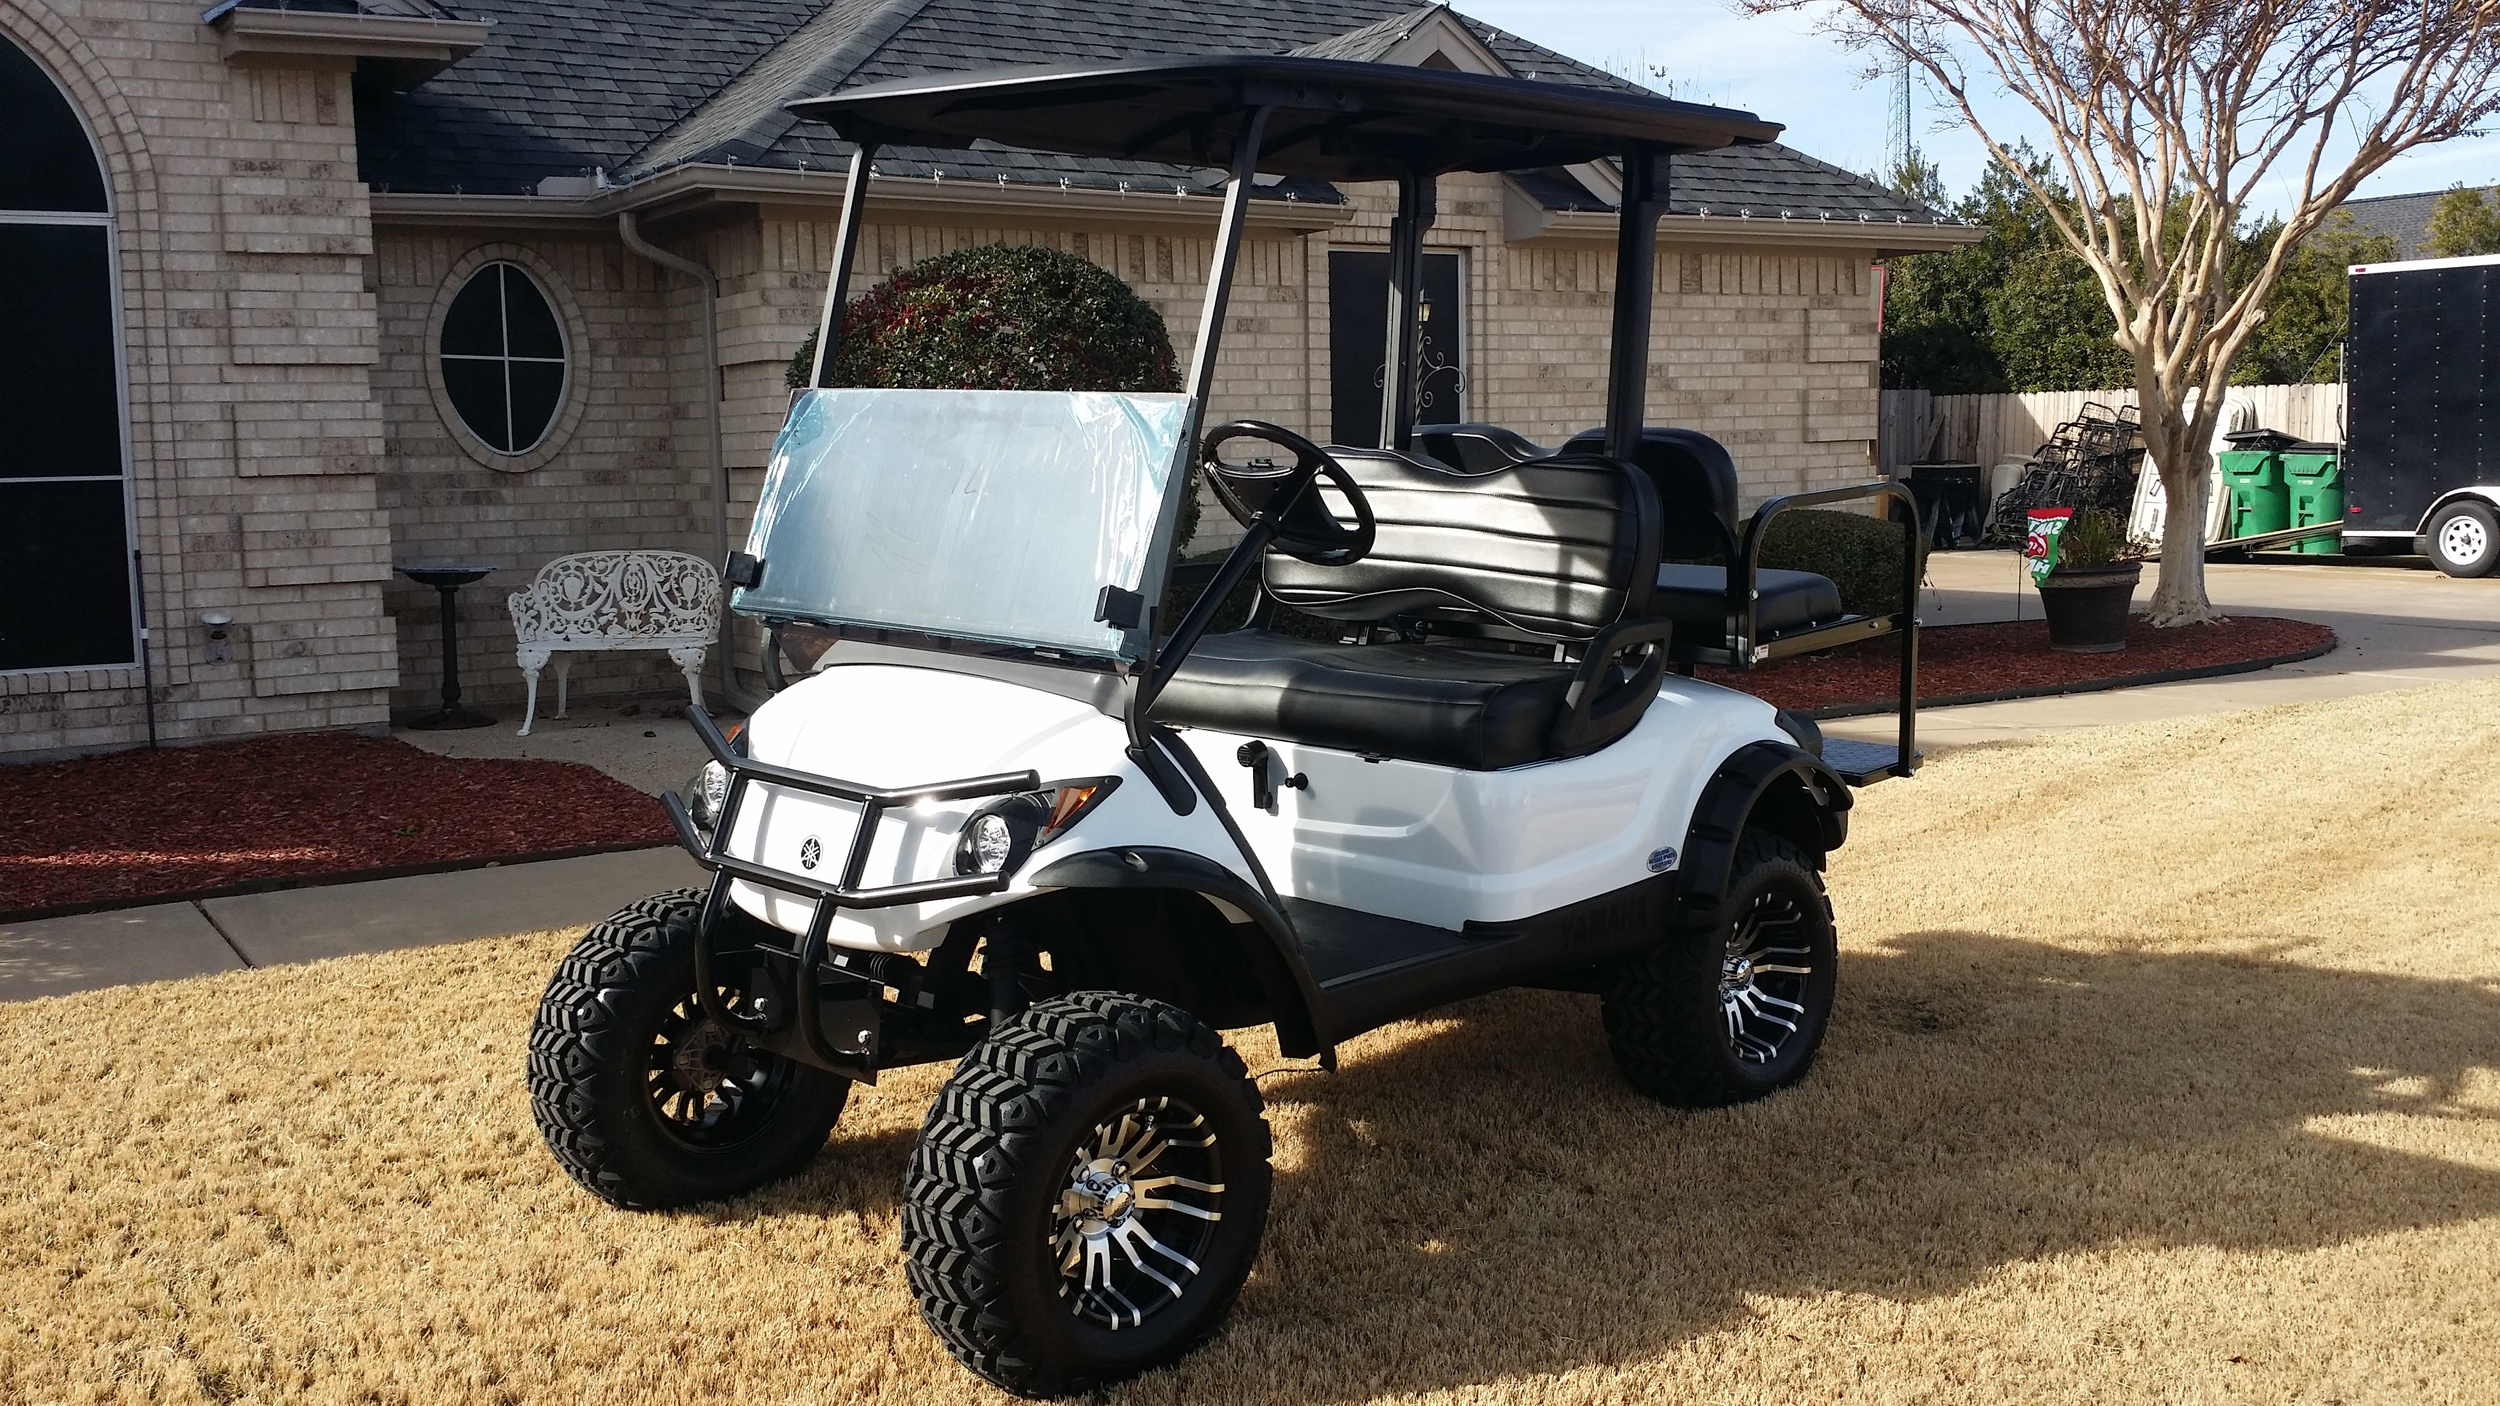 Burleson Outdoor Sports on bag boy cart parts, yamaha auto parts, yamaha rhino 4 seater, yamaha utv parts, yamaha u max utility cart, yamaha volt, yamaha rhino 3 inch lift, yamaha chopper parts, yamaha fz1 parts, yamaha parts diagram, golf bag parts, yamaha beverage cart, golf car parts, ezgo cart parts, yamaha performance parts, hdk golf carts parts, yamaha rhino 1000, yamaha plow parts,